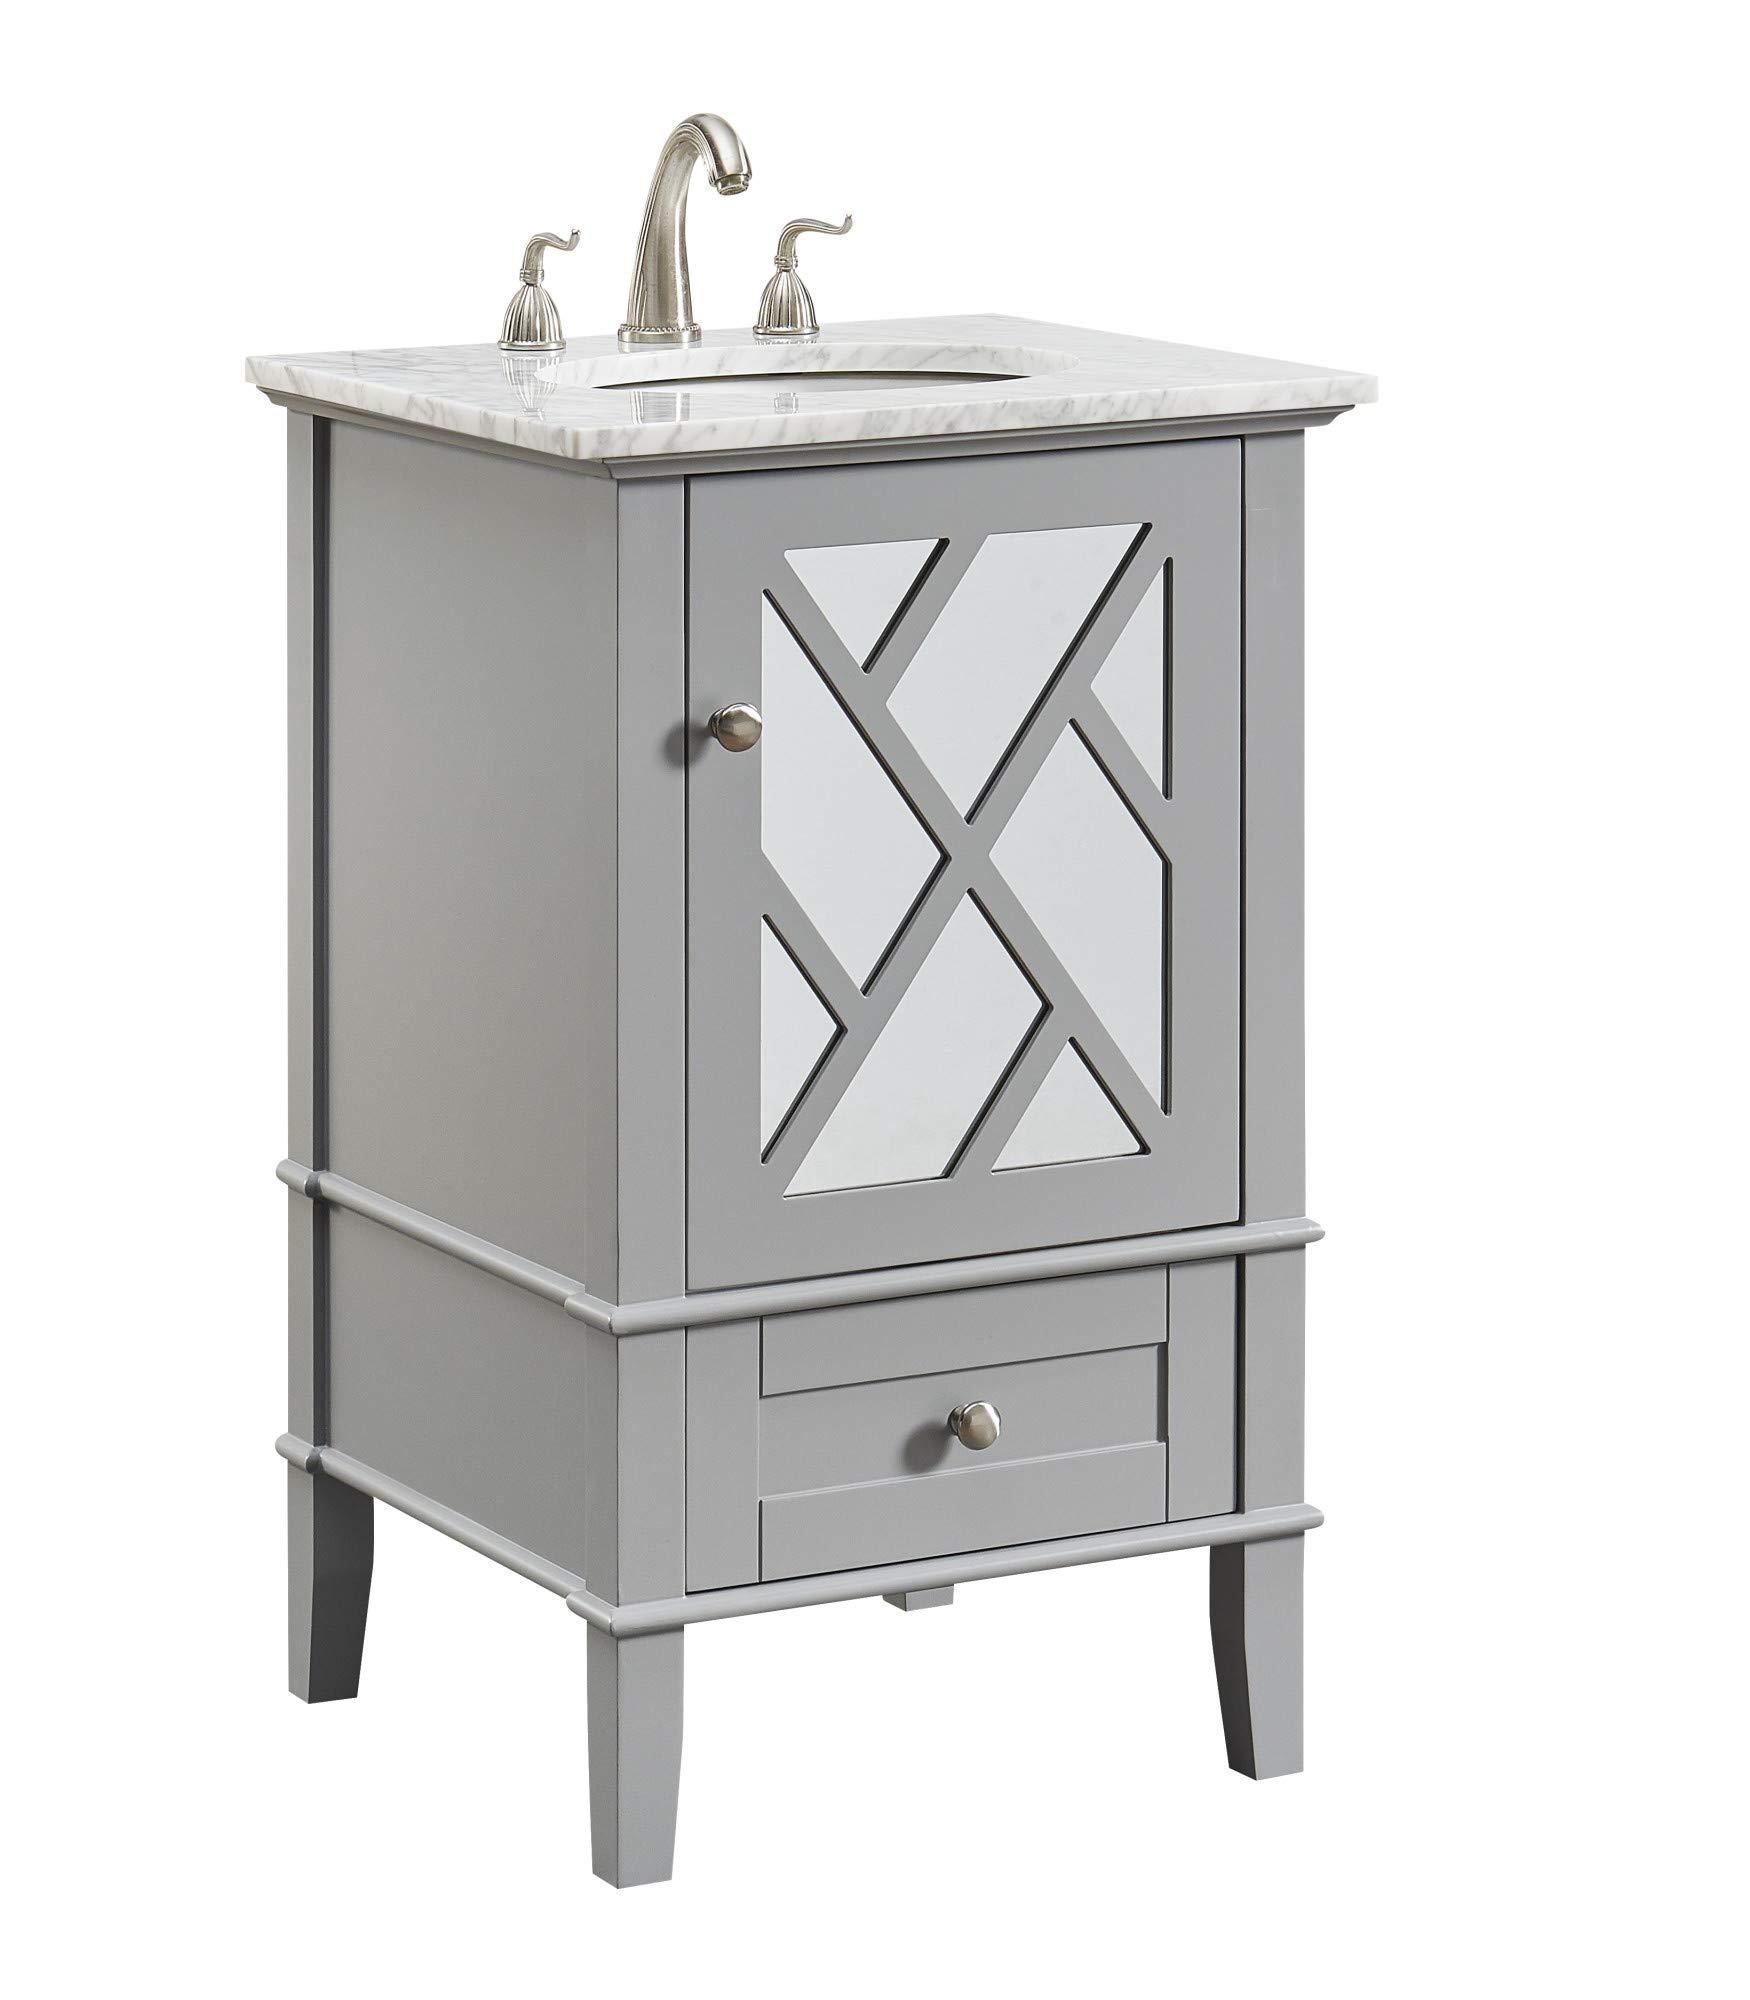 Elegant Decor 21 In Single Bathroom Vanity Set In Grey Amazon Com